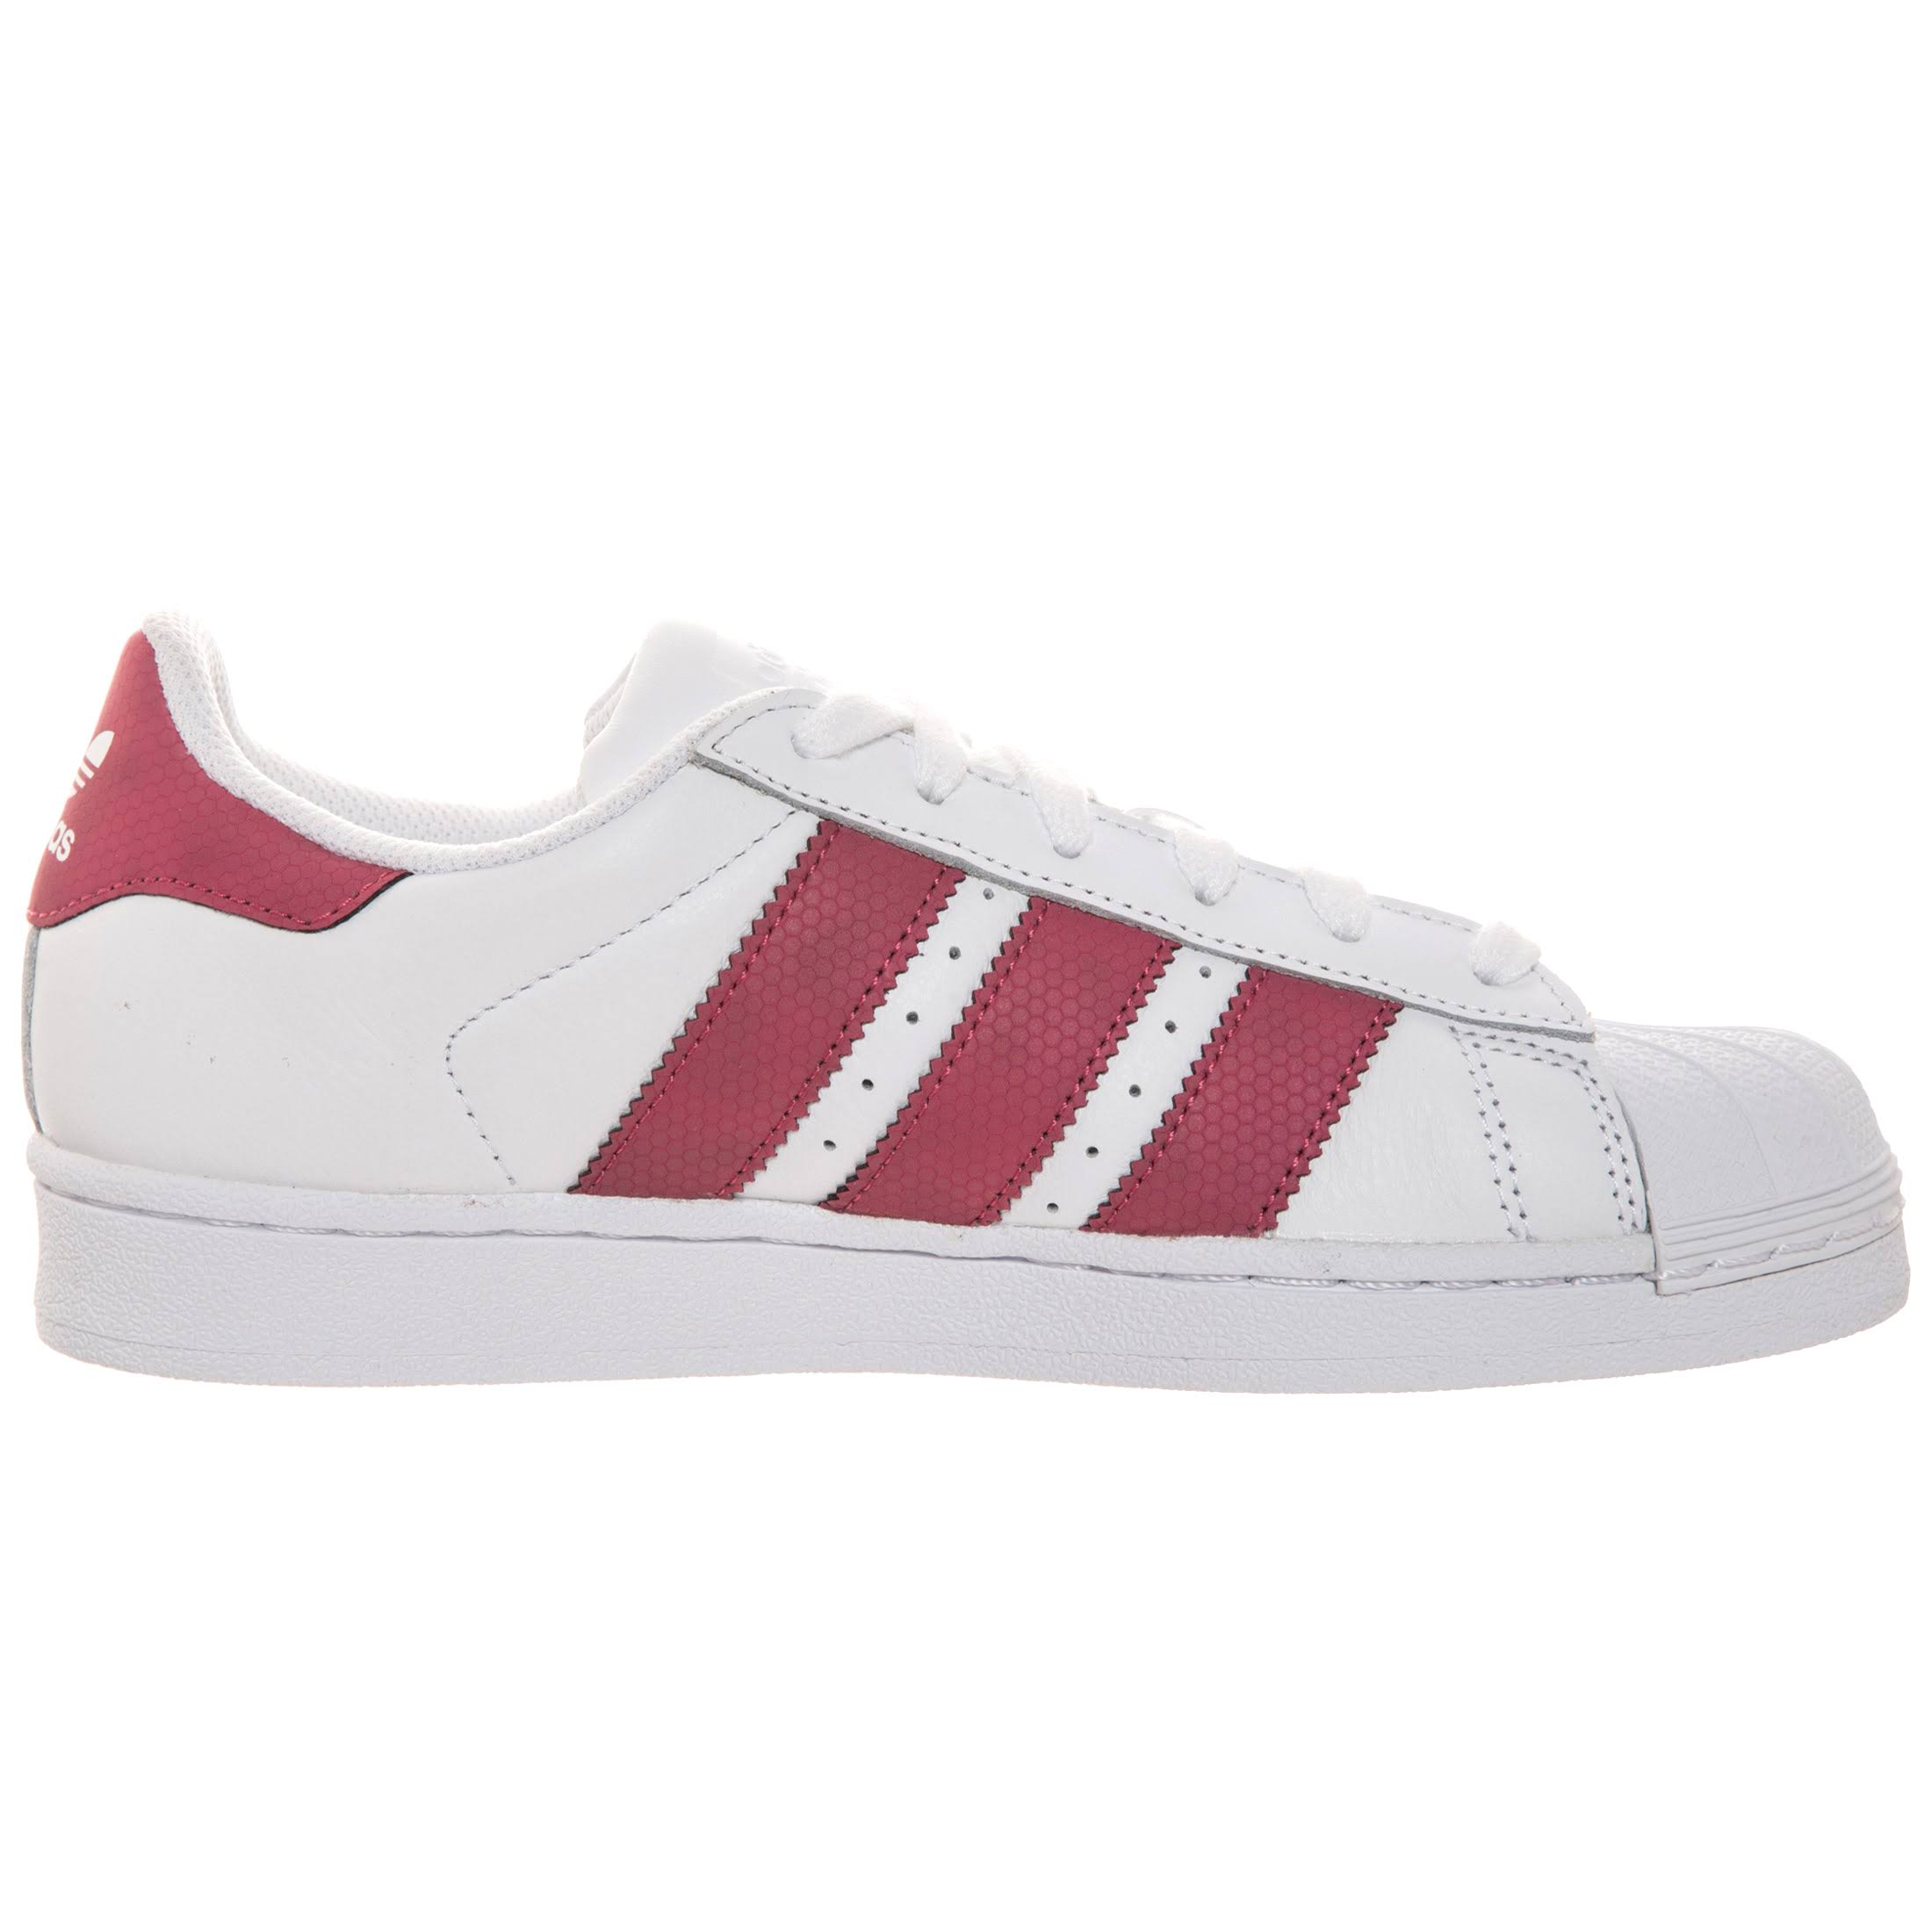 Adidas Cq2723 J Originals reflective Superstar 2 Sneaker 36 3 White 4qH4R